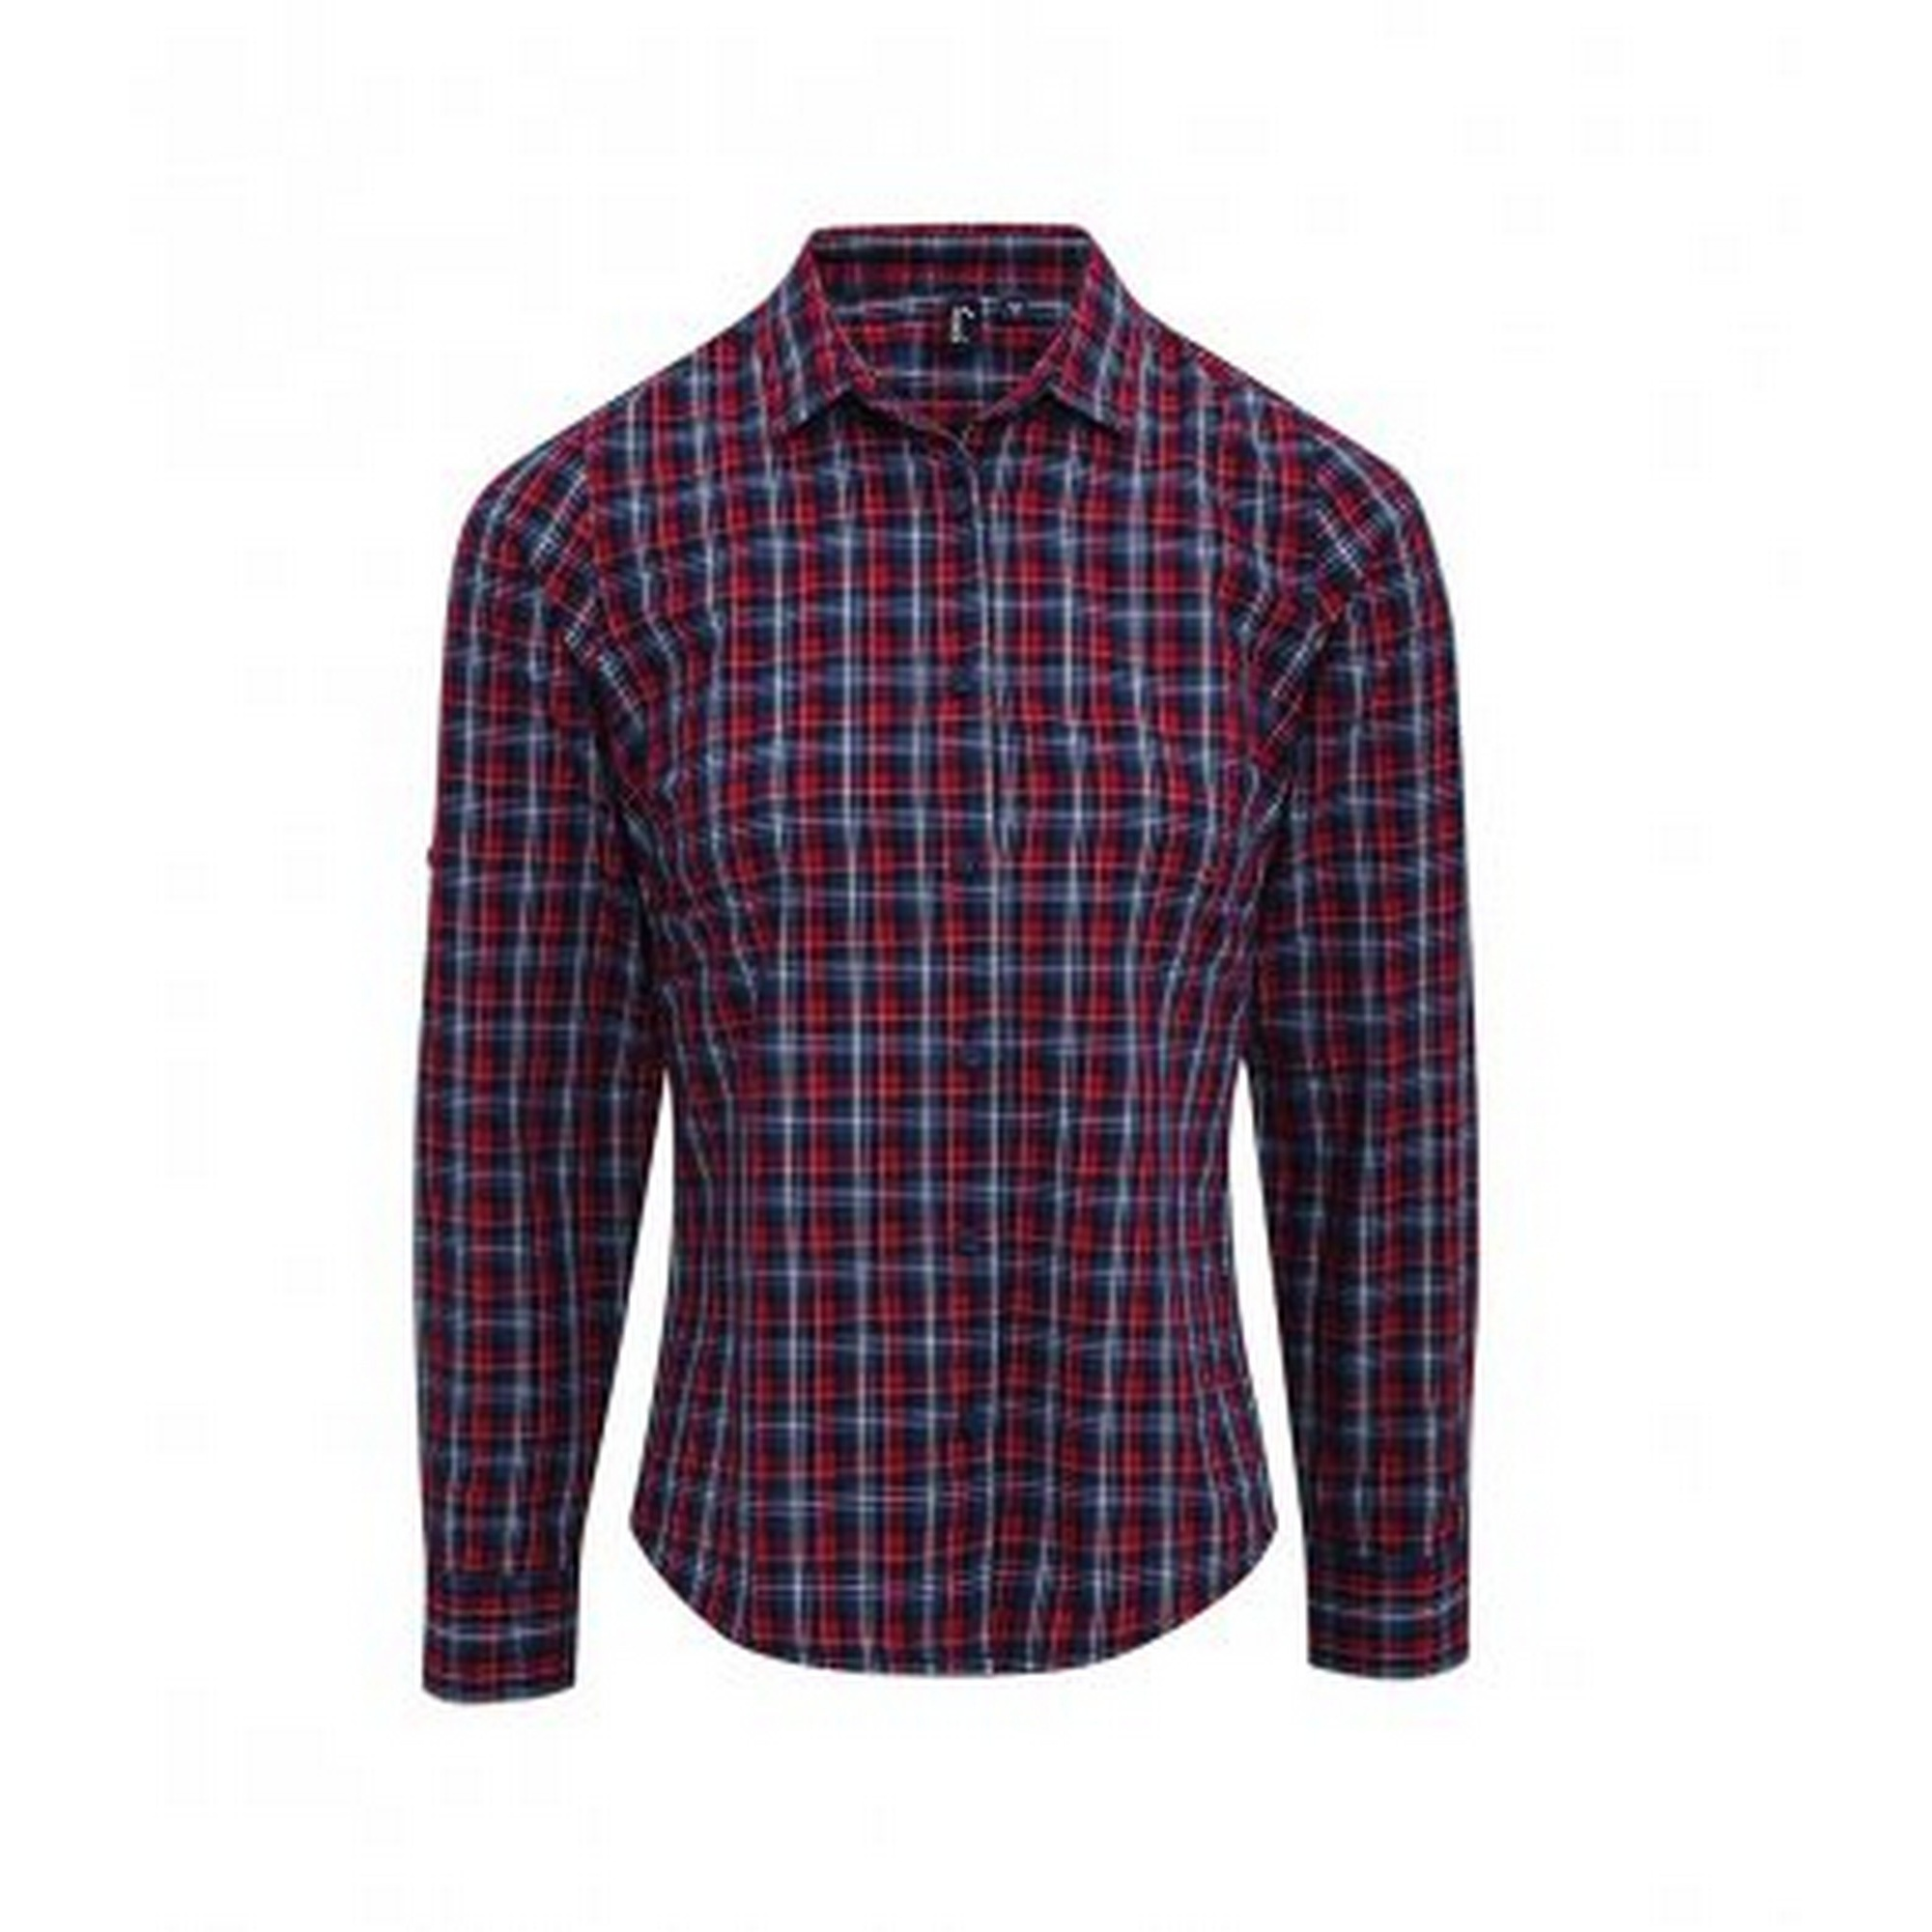 Premier-Camisa-a-cuadros-de-manga-larga-modelo-Sidehill-para-mujer-PC3106